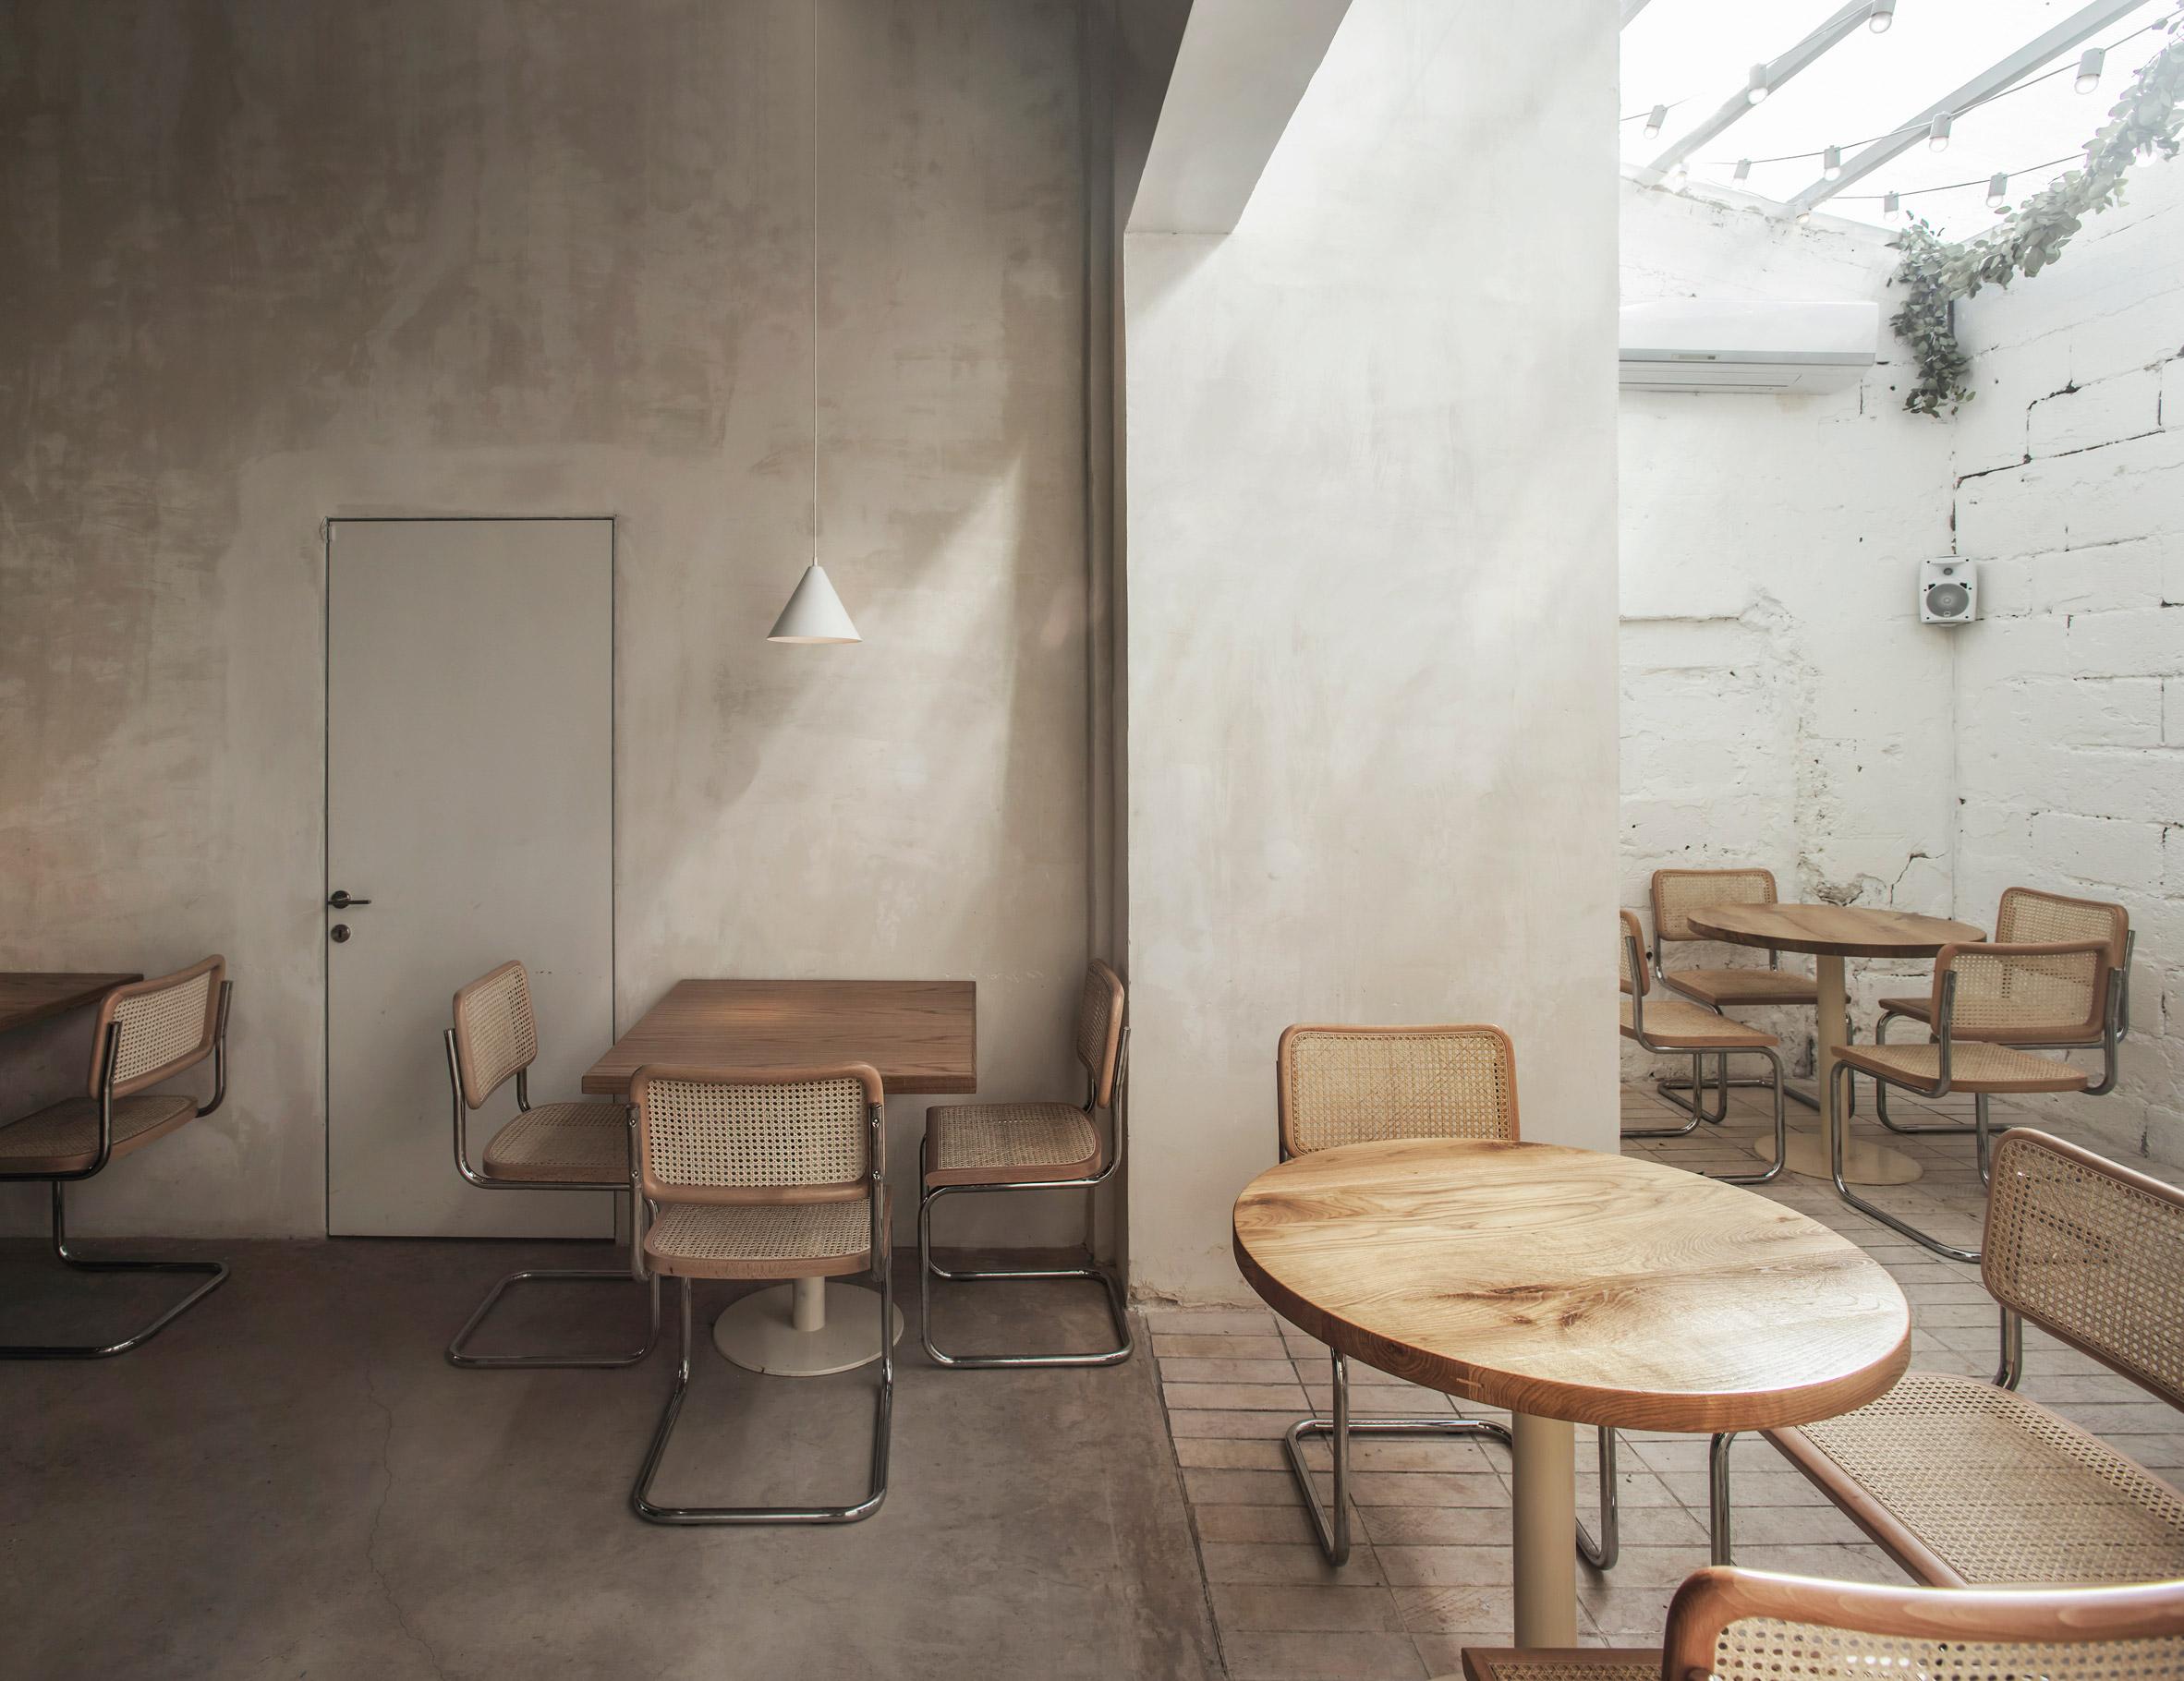 Interiors of Tel Aviv's Opa restaurant, designed by Craft & Bloom and Vered Kadouri